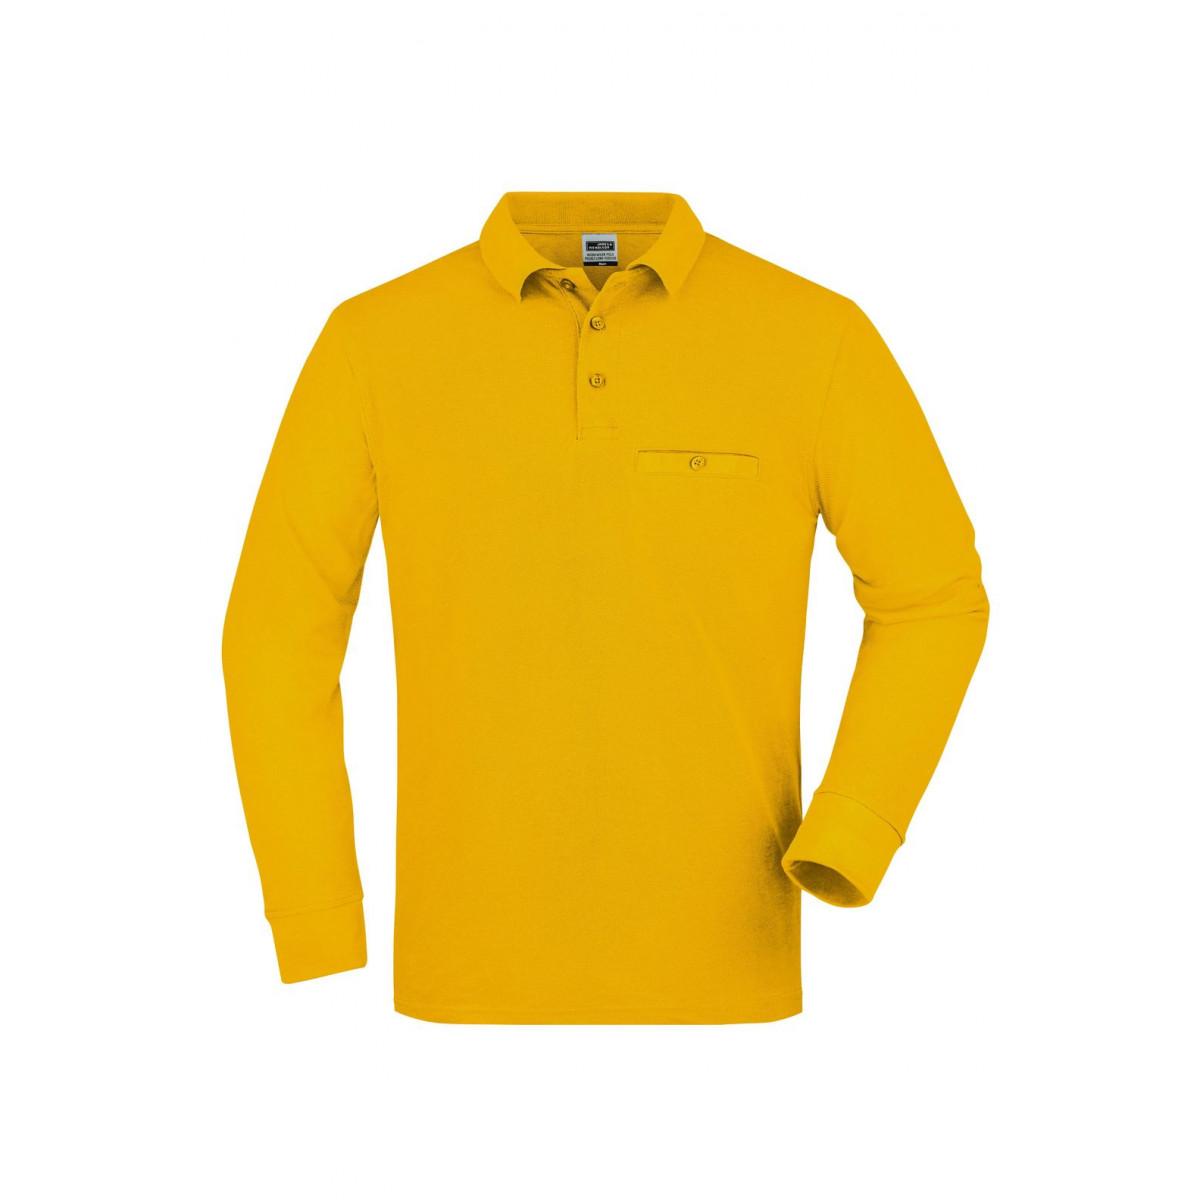 Рубашка поло мужская JN866 Mens Workwear Polo Pocket Longsleeve - Золоистый желтый